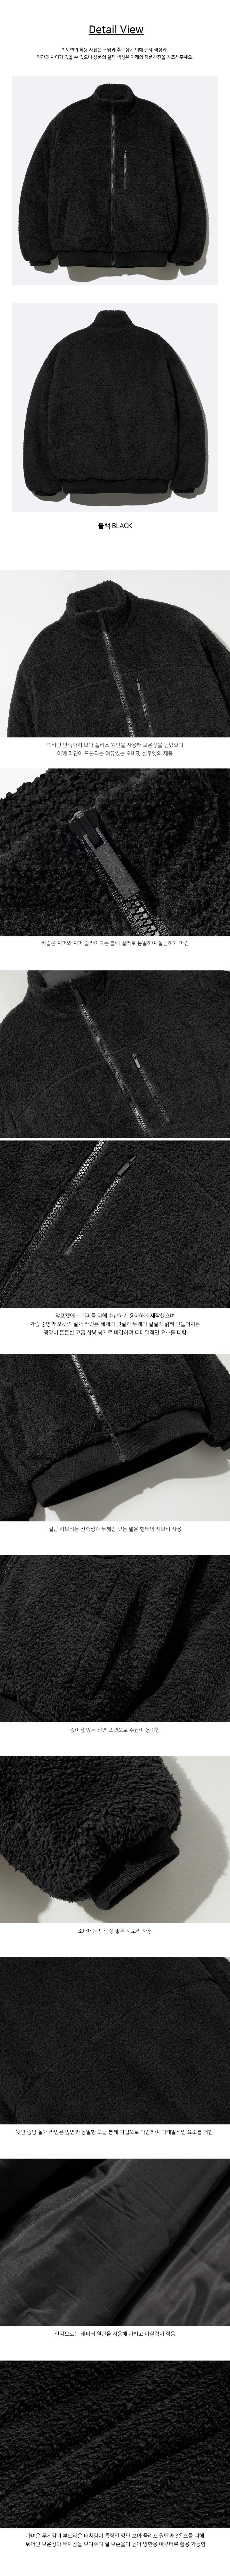 YHJK2315_detail_black_yh.jpg